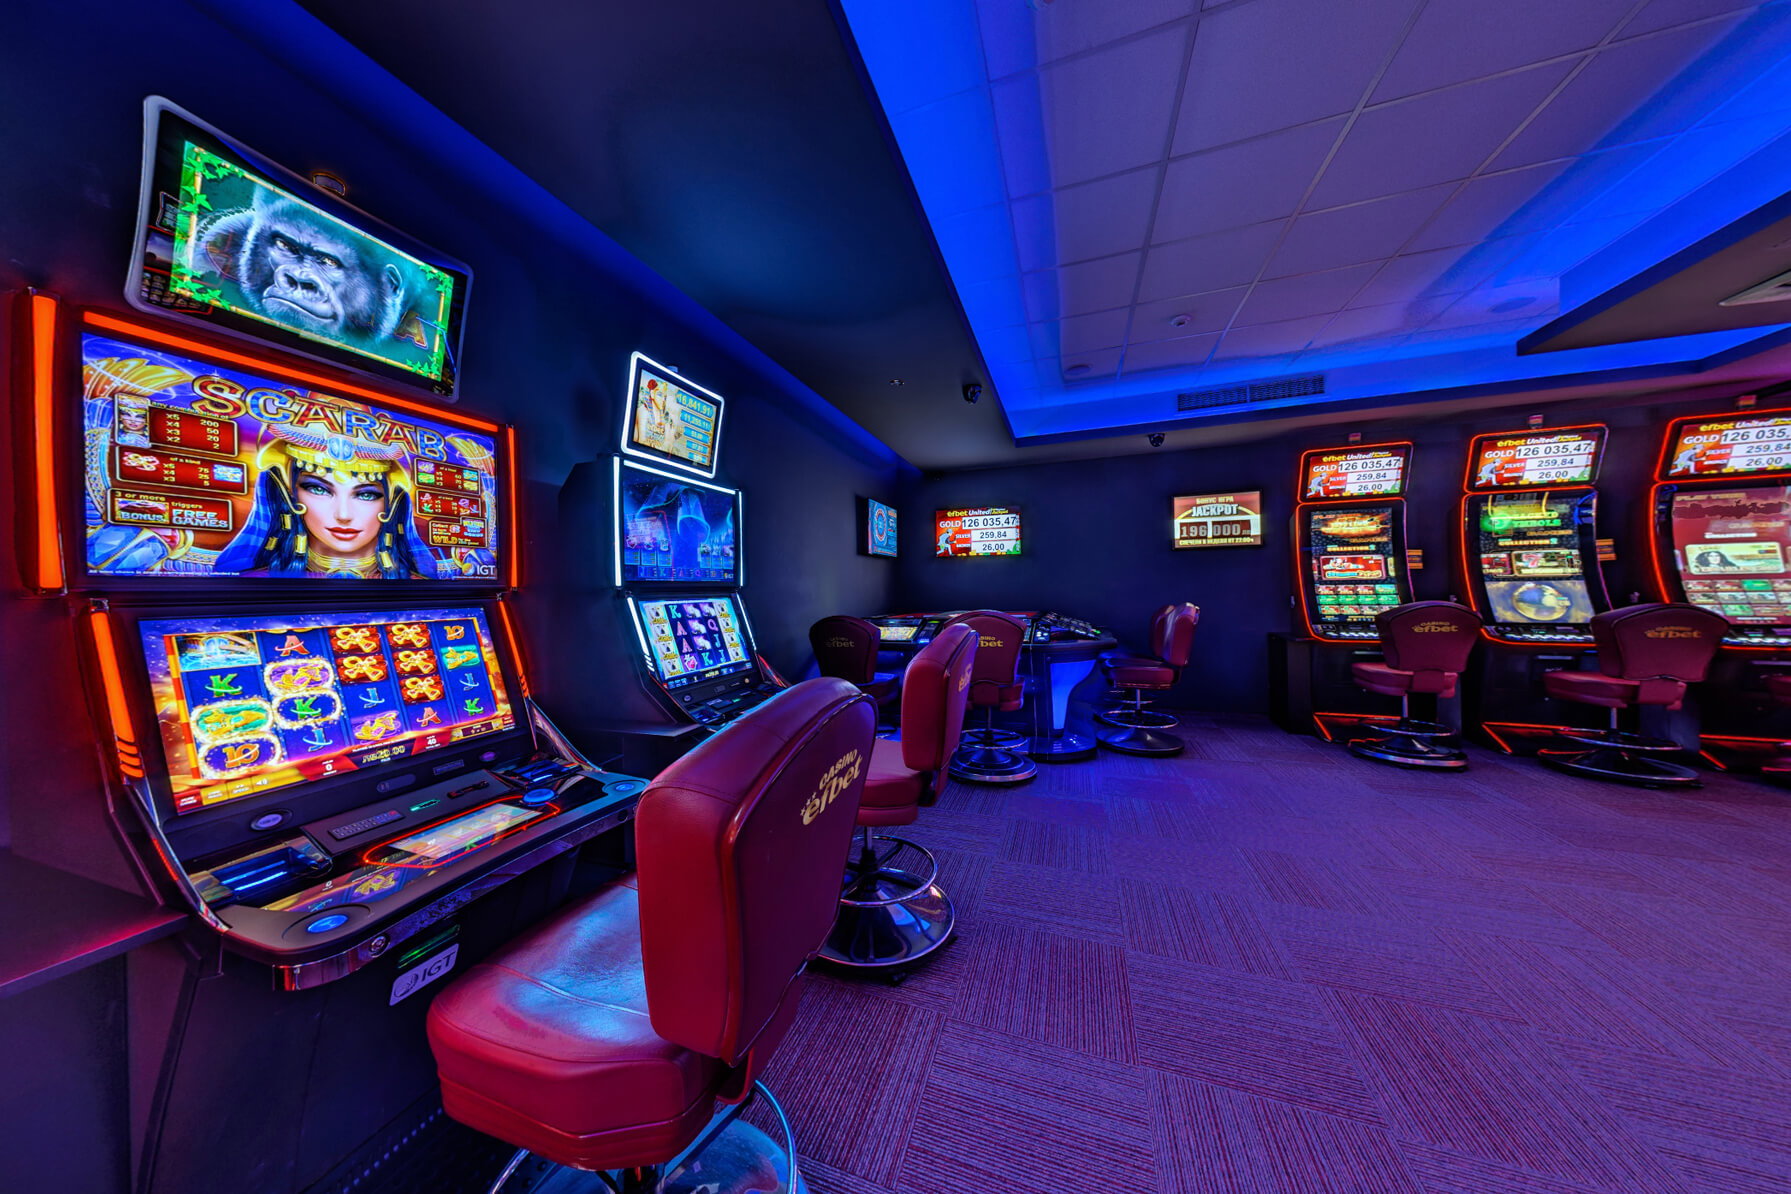 boaboa казино промокод бездепозитный бонус